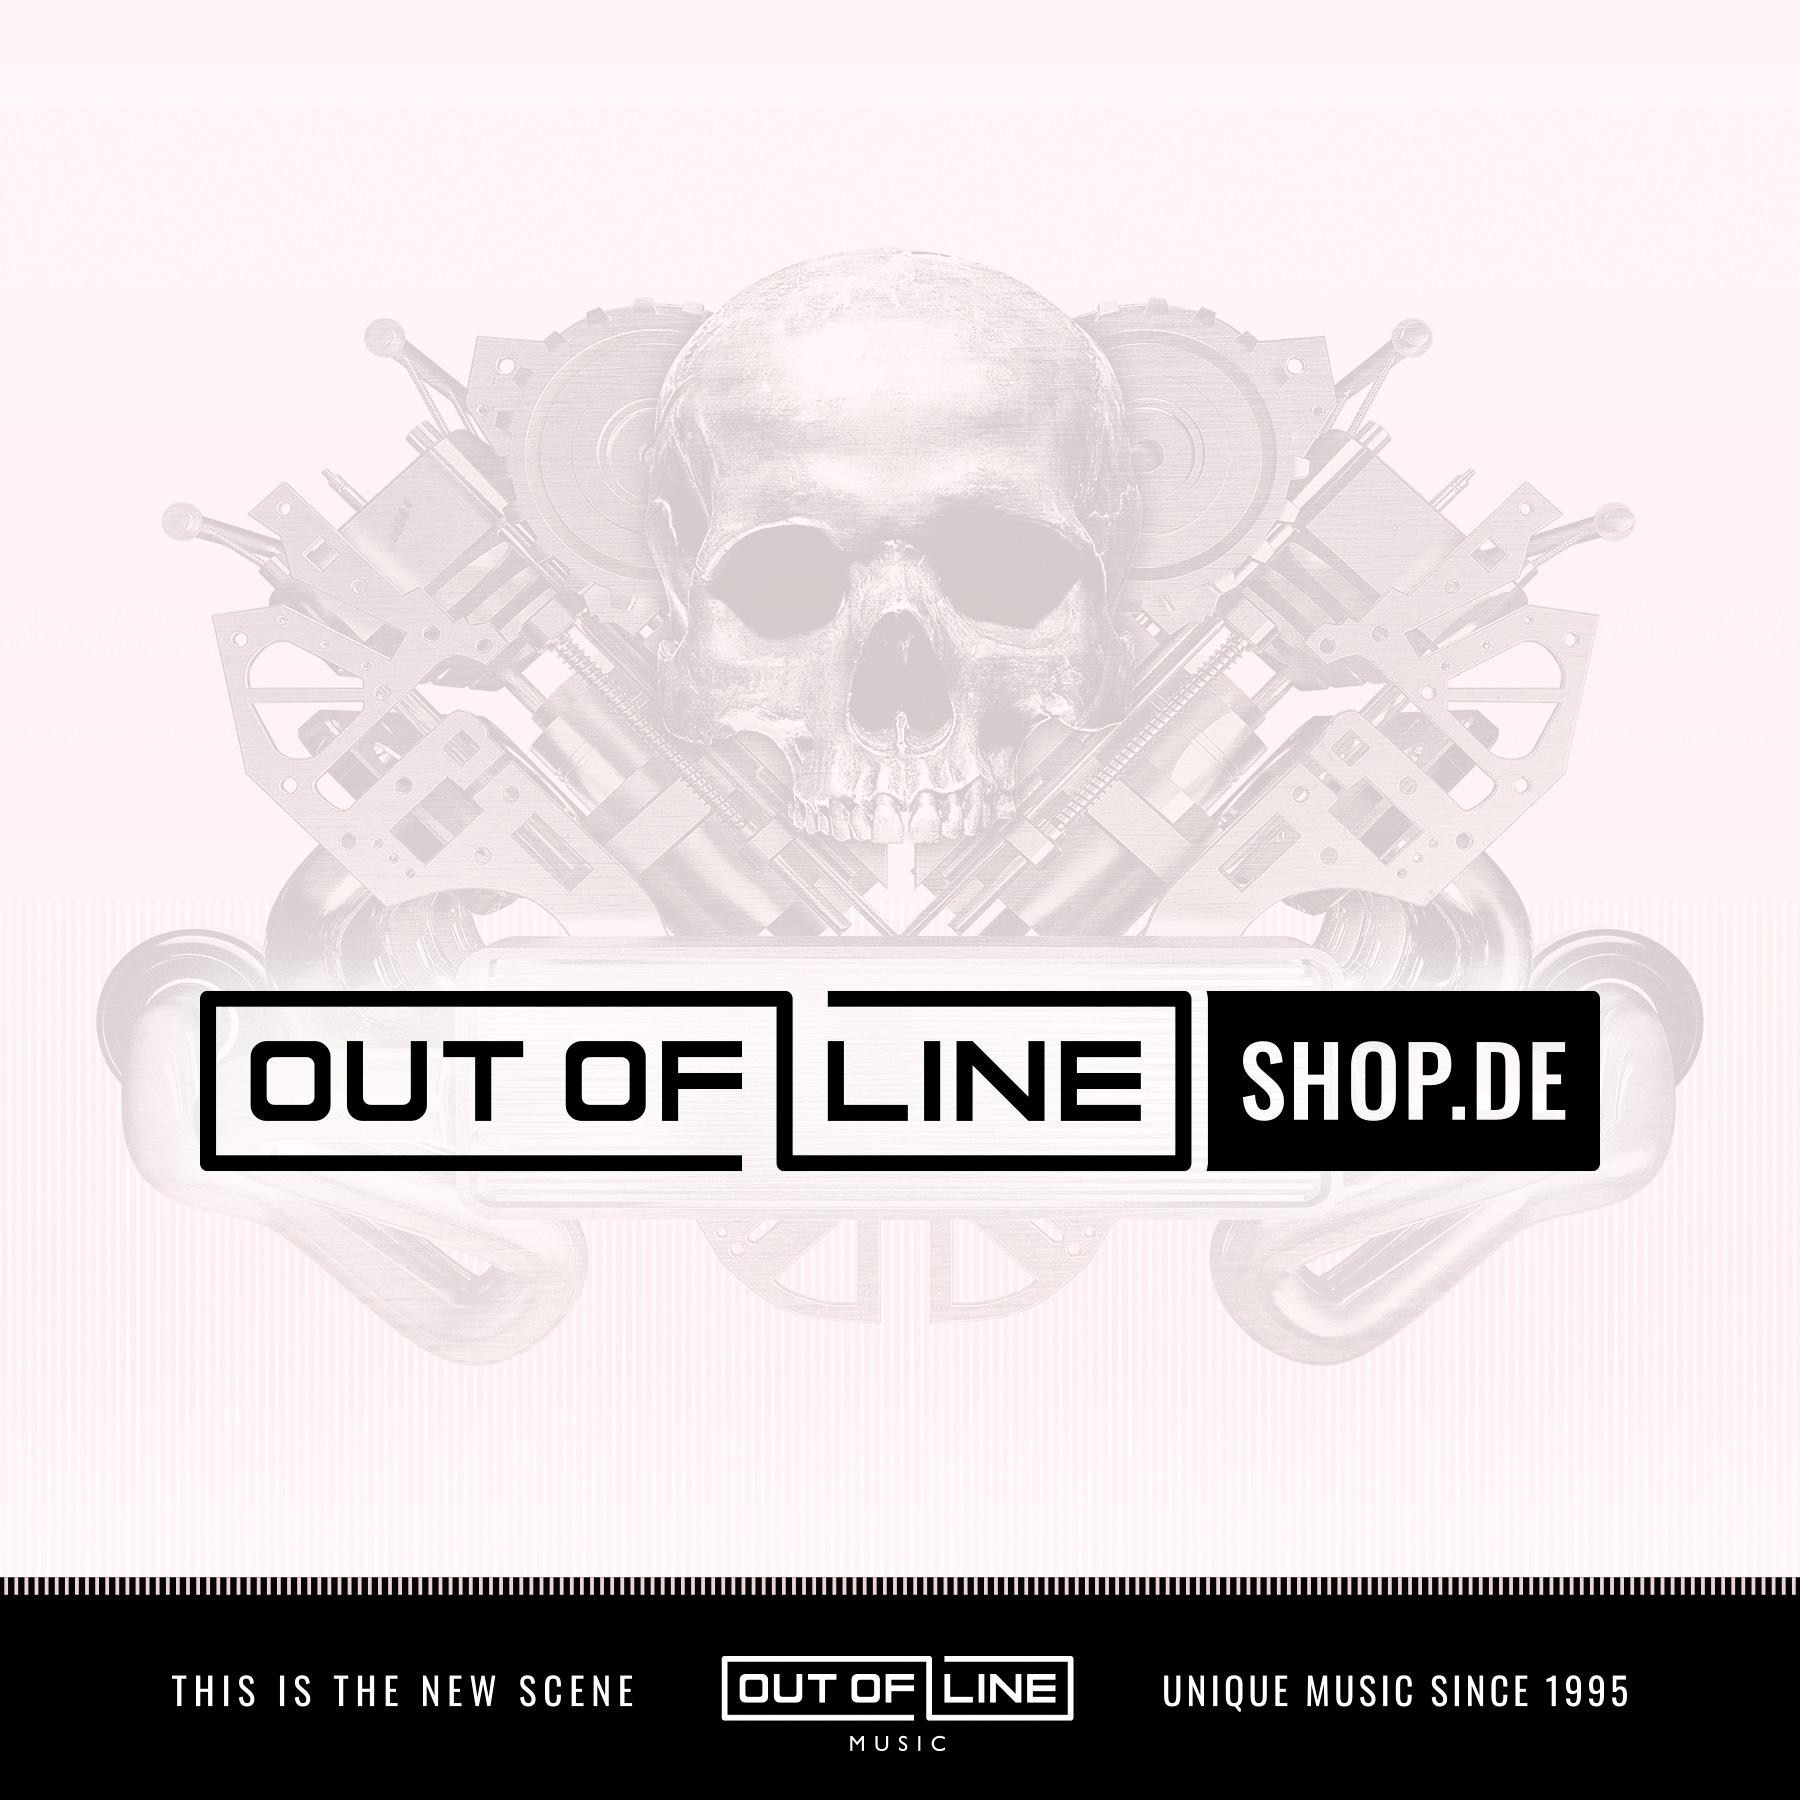 Eisfabrik - Kryothermalmusik aus der Eisfabrik - CD